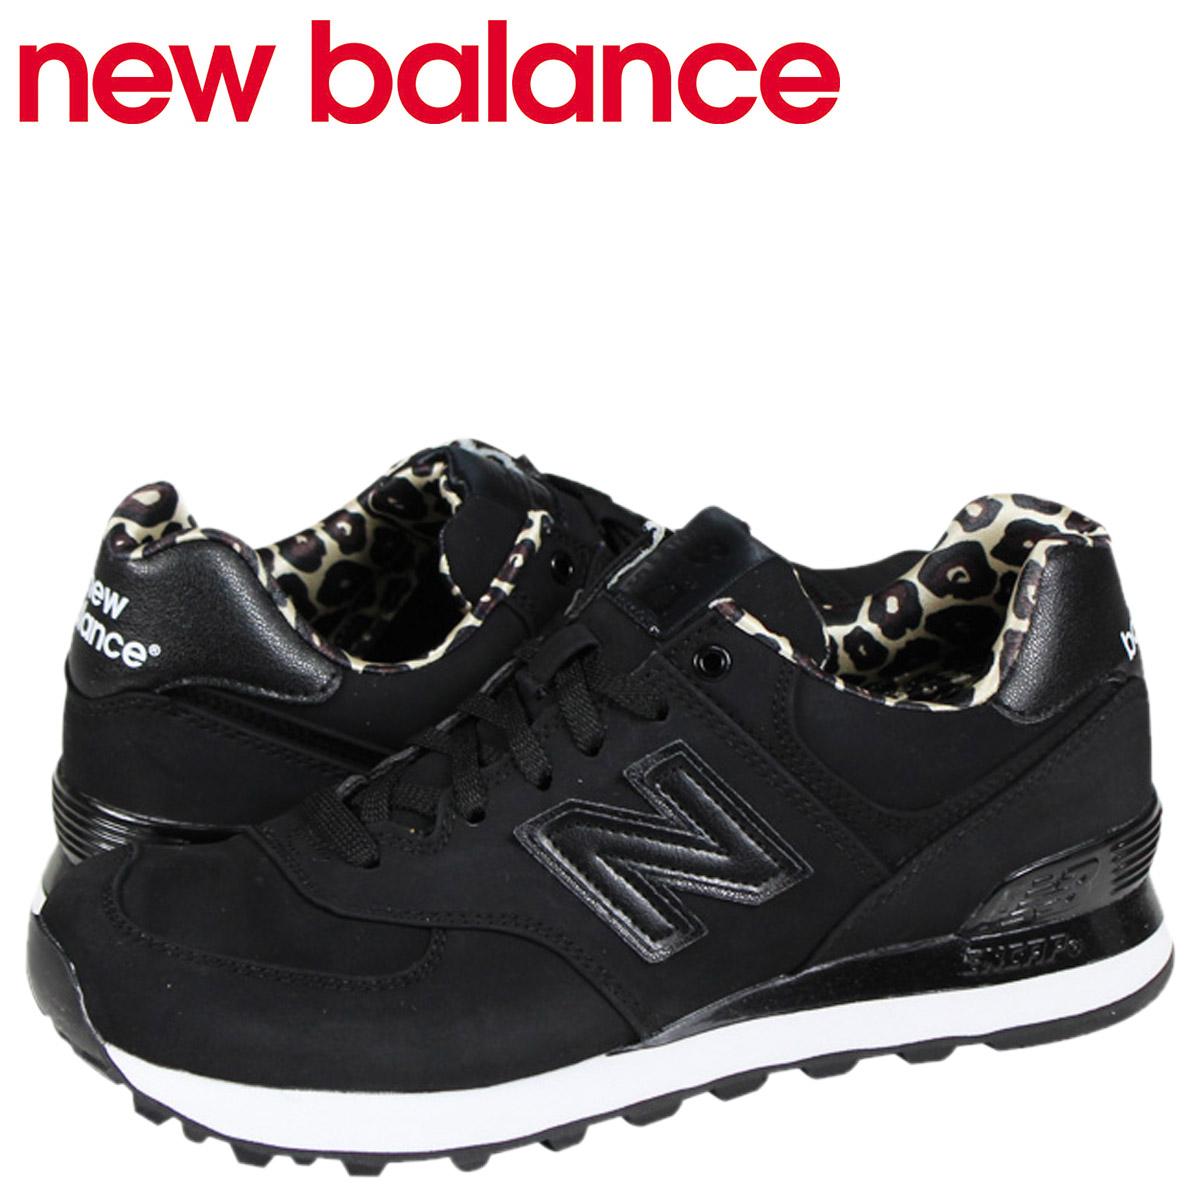 best service 79822 d7a09 new balance New Balance WL574SPK Lady's sneakers B Wise nubuck HIGH ROLLER  PACK black